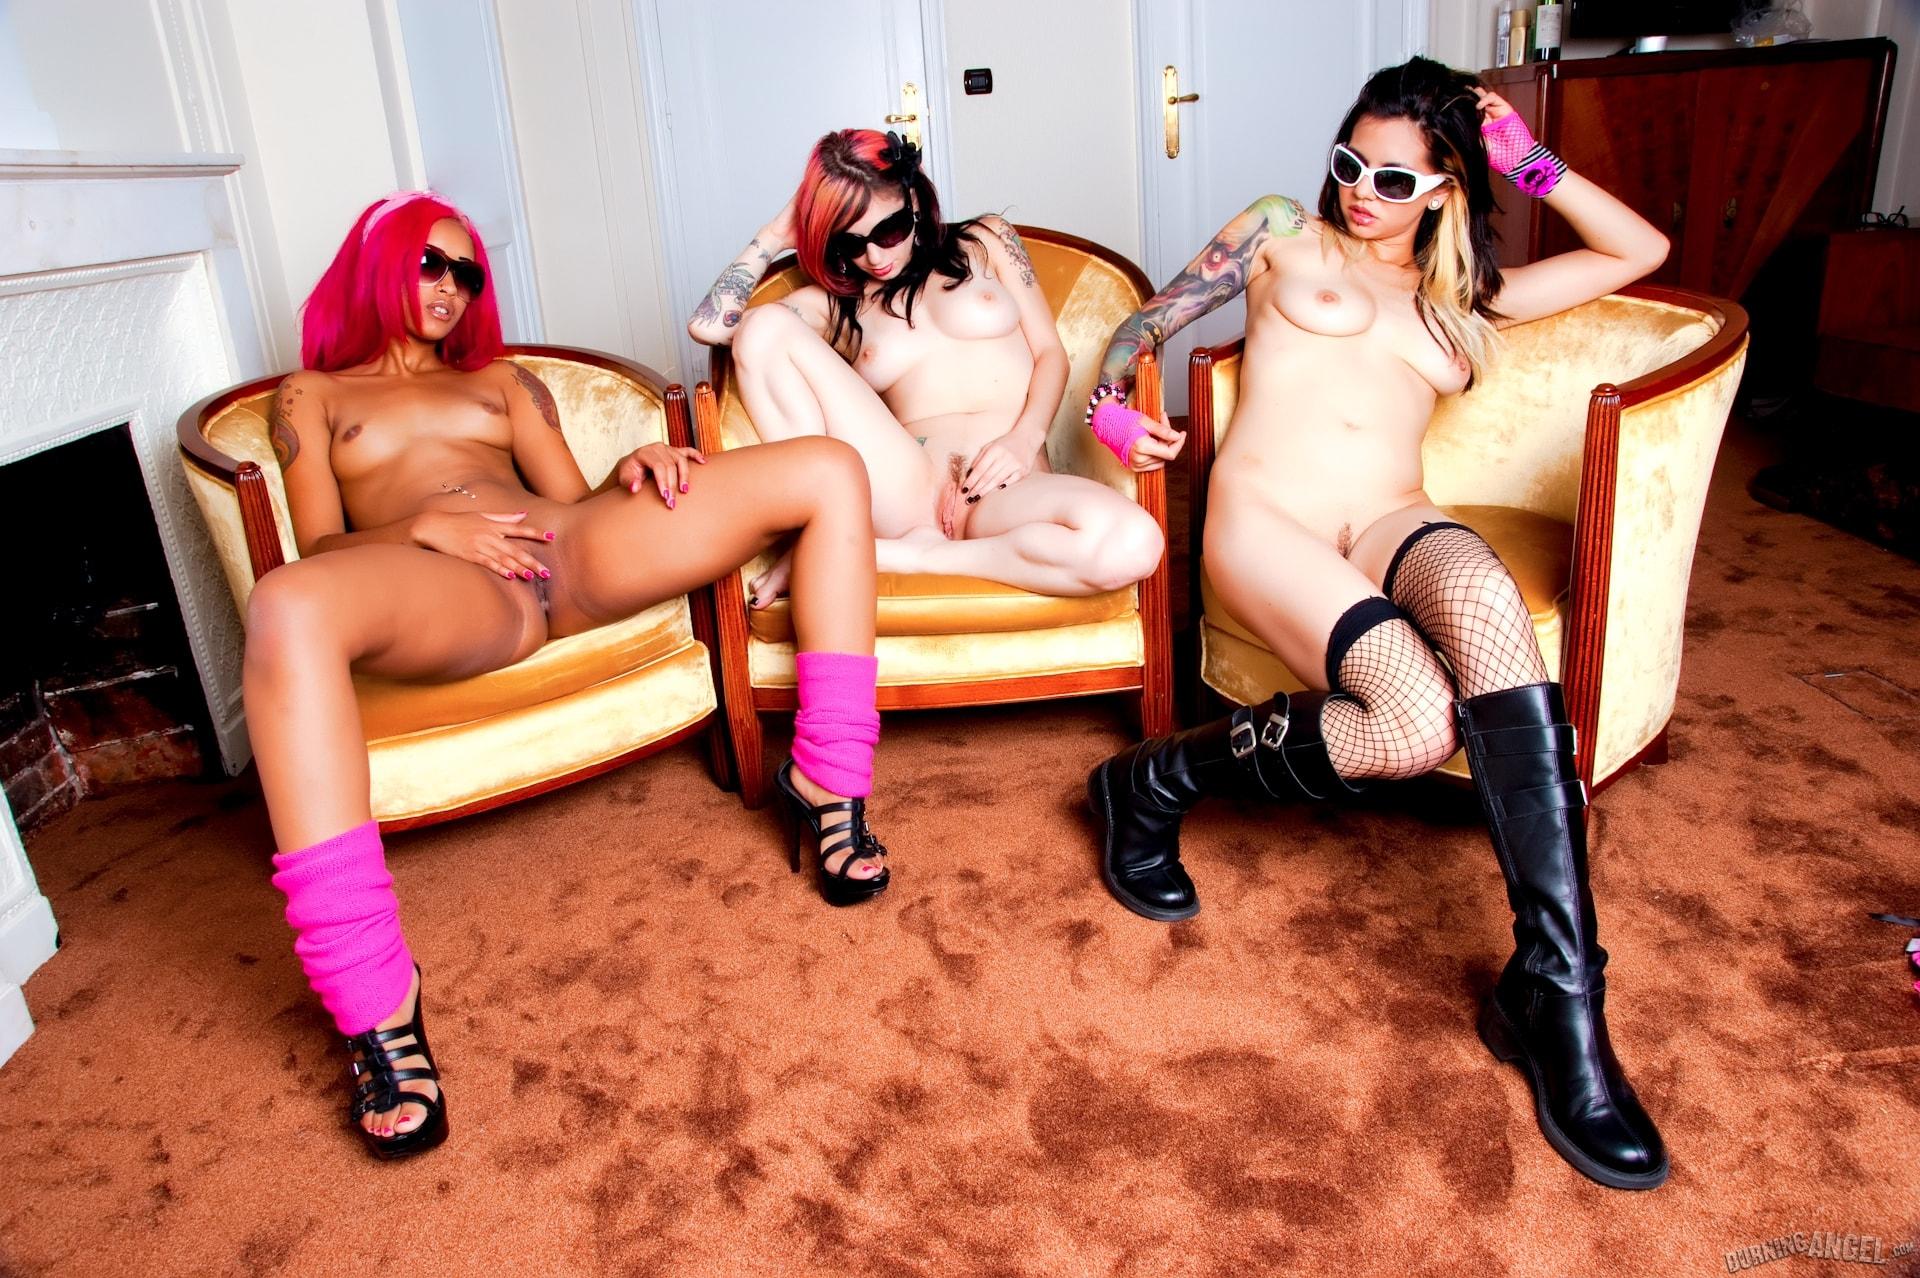 Burning Angel 'Black and Pink Sex Fest' starring Joanna Angel (Photo 15)